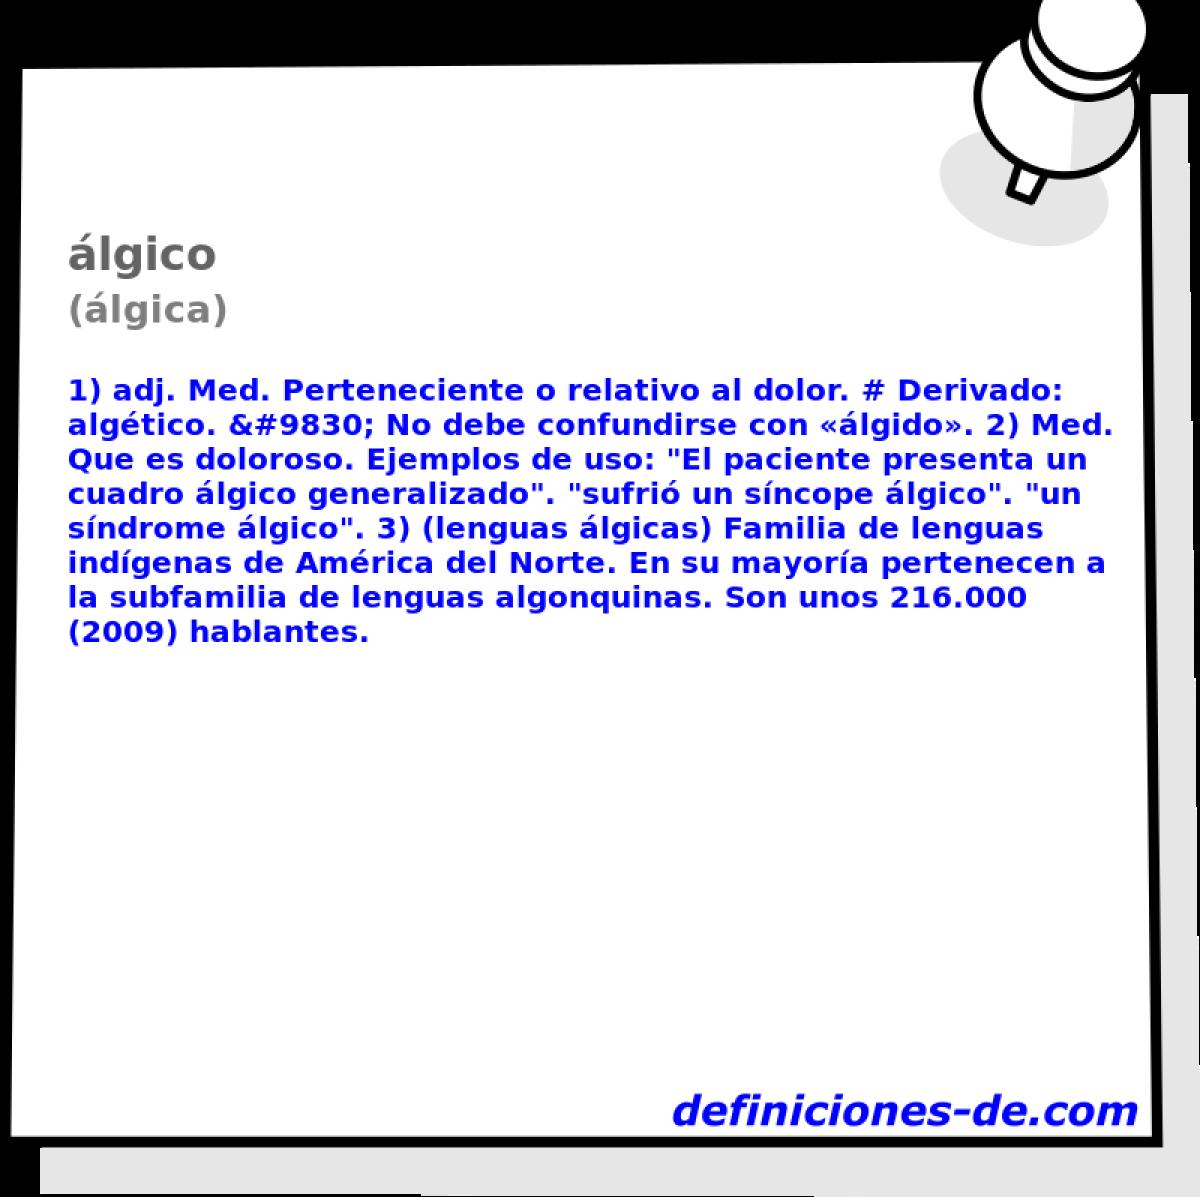 Qué significa álgico (álgica)?